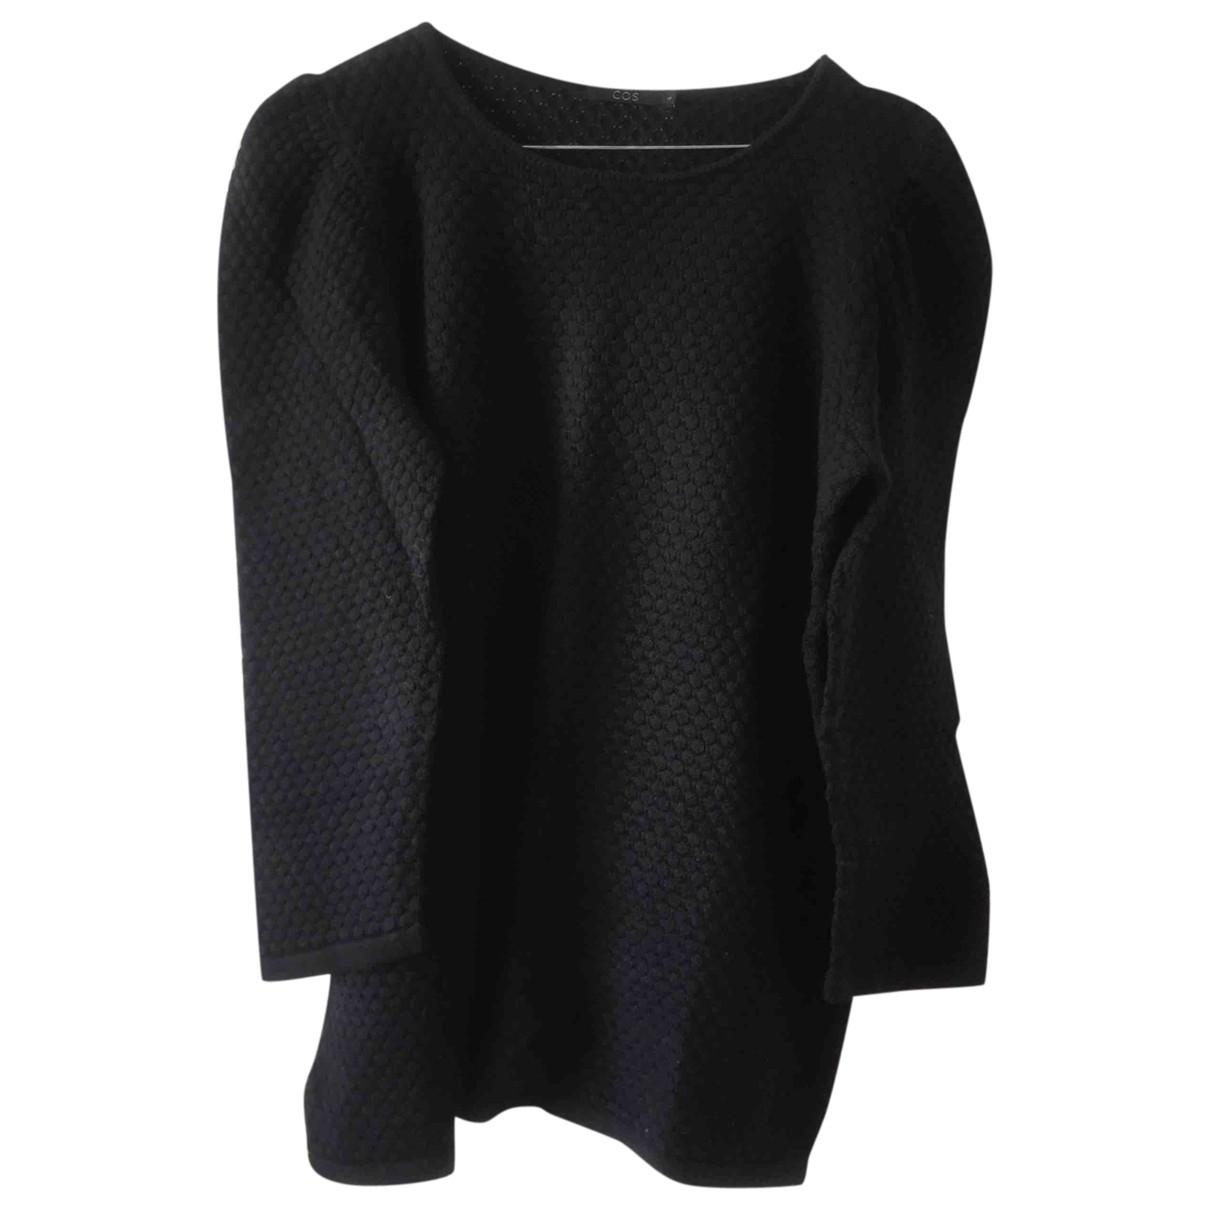 Cos \N Pullover in  Schwarz Baumwolle